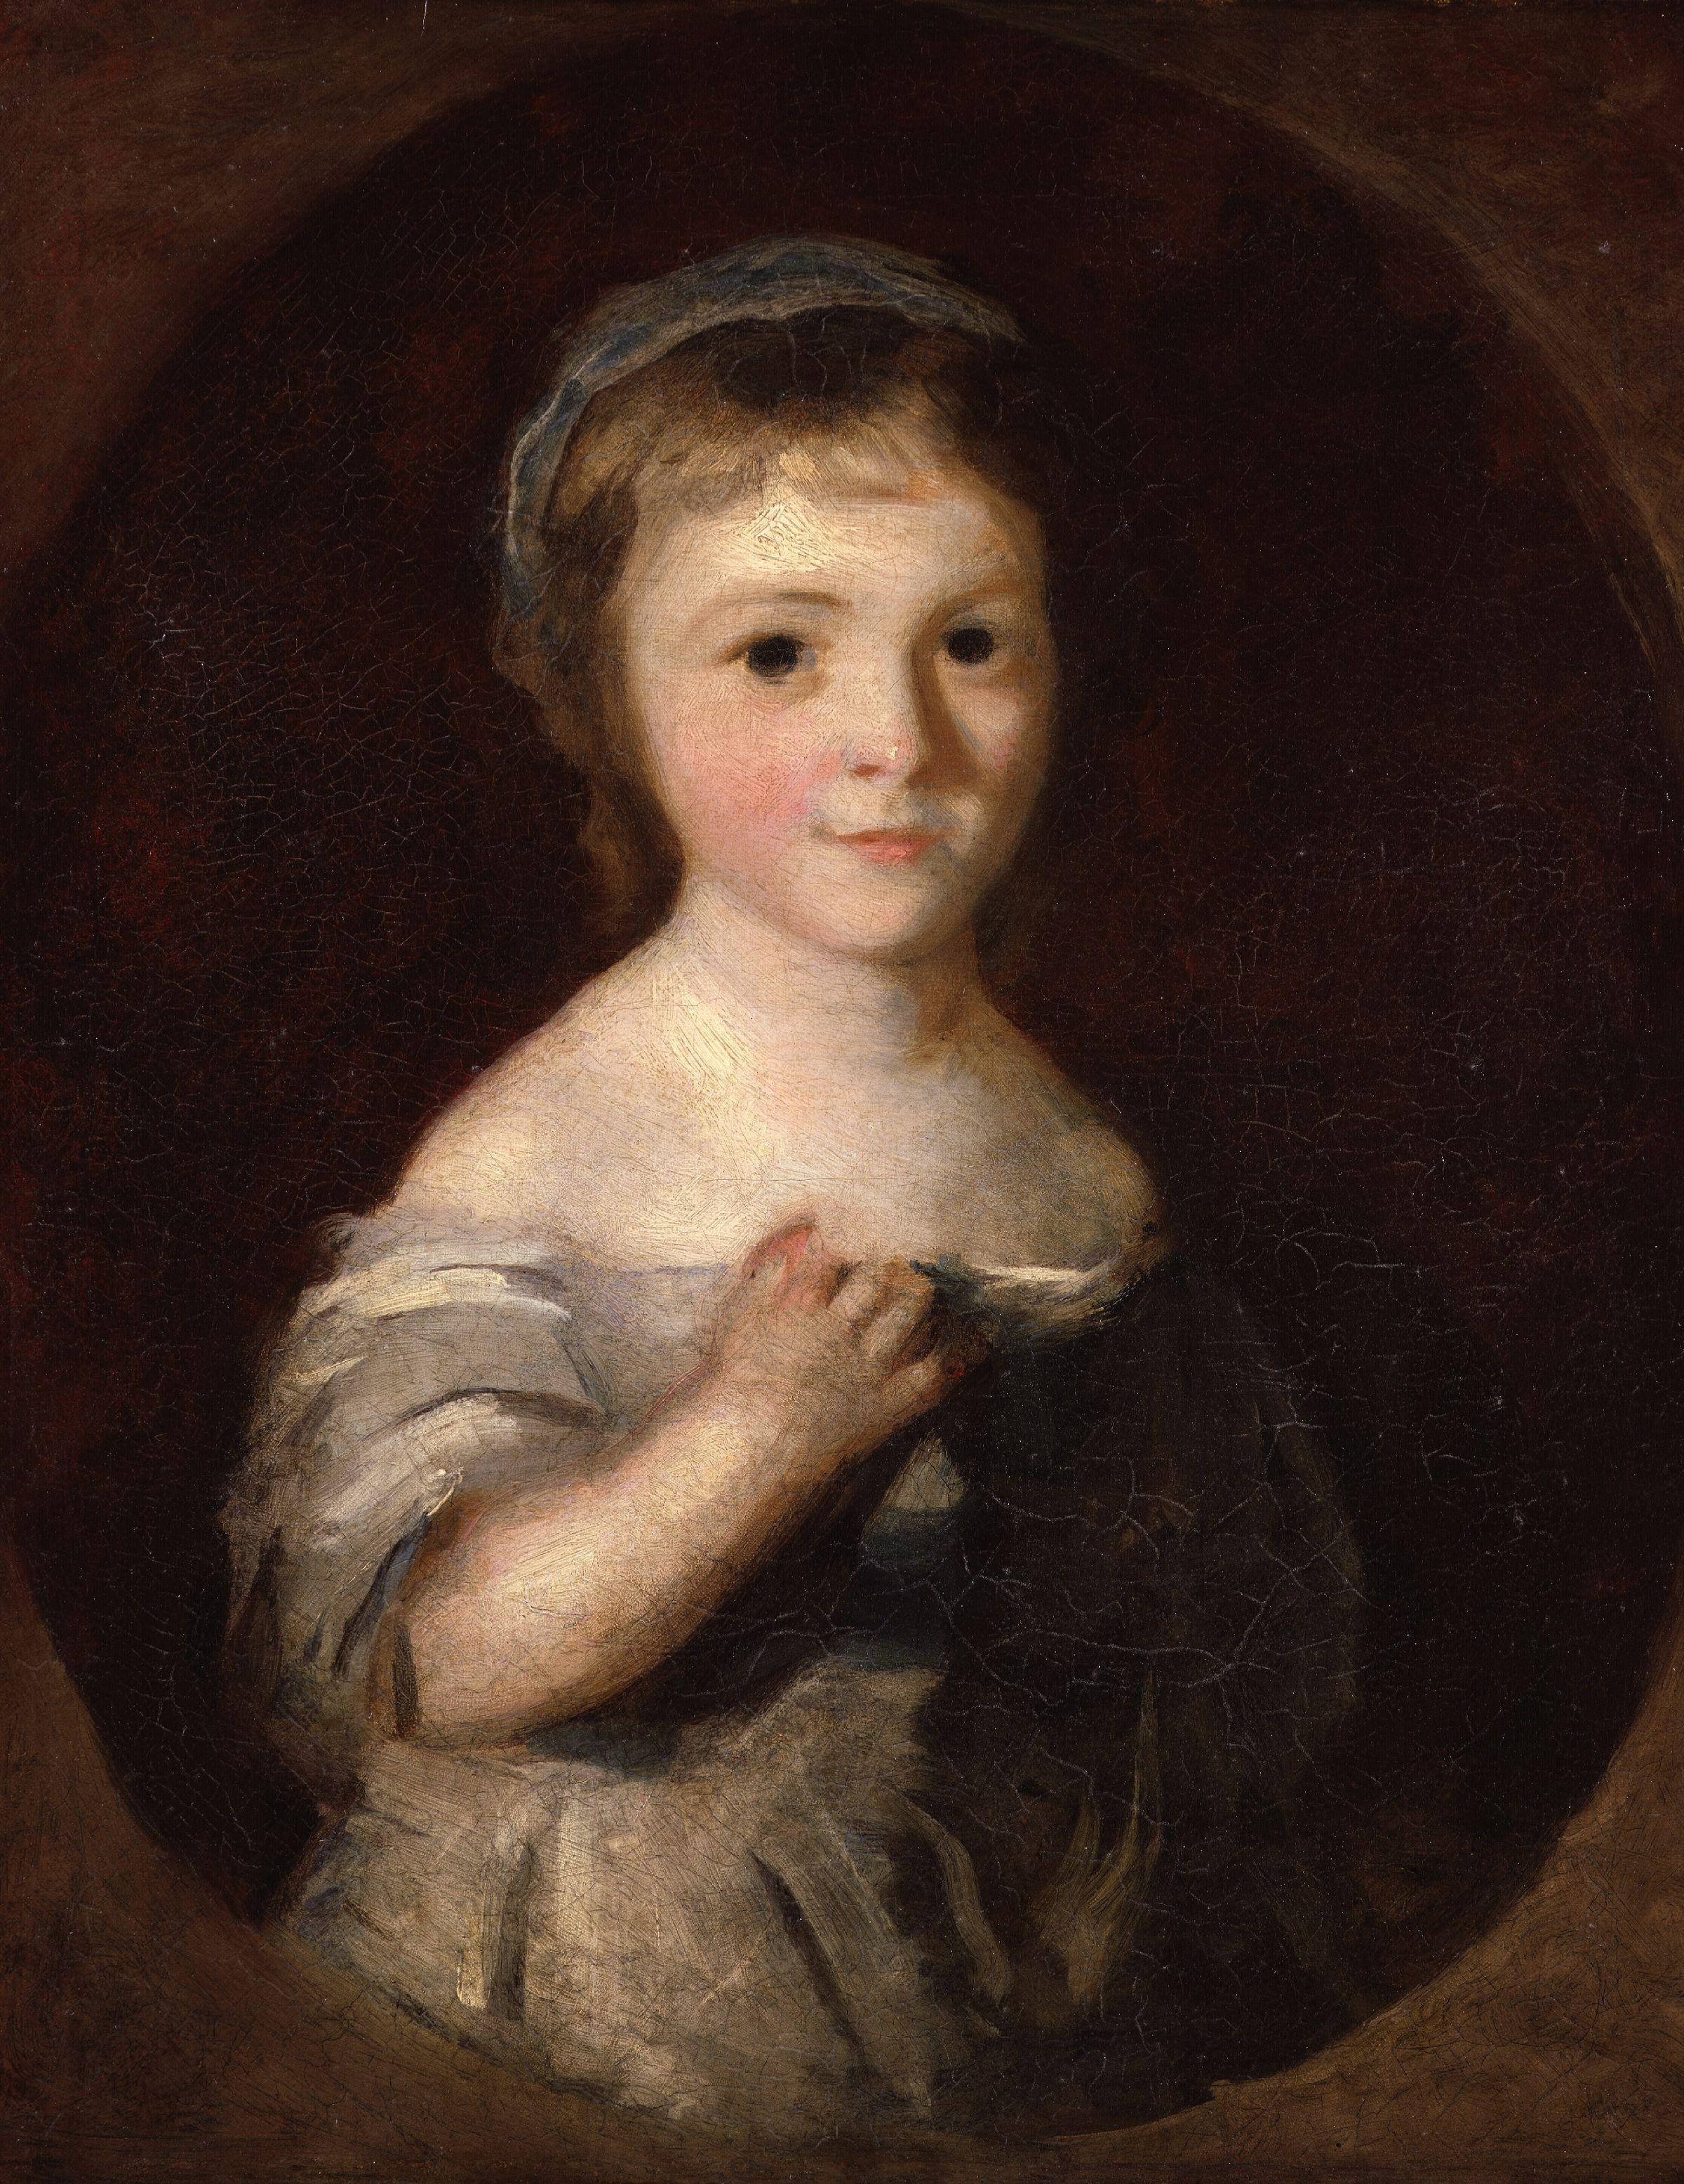 Sir Joshua Reynolds Portrait Of Lady Georgiana Spencer